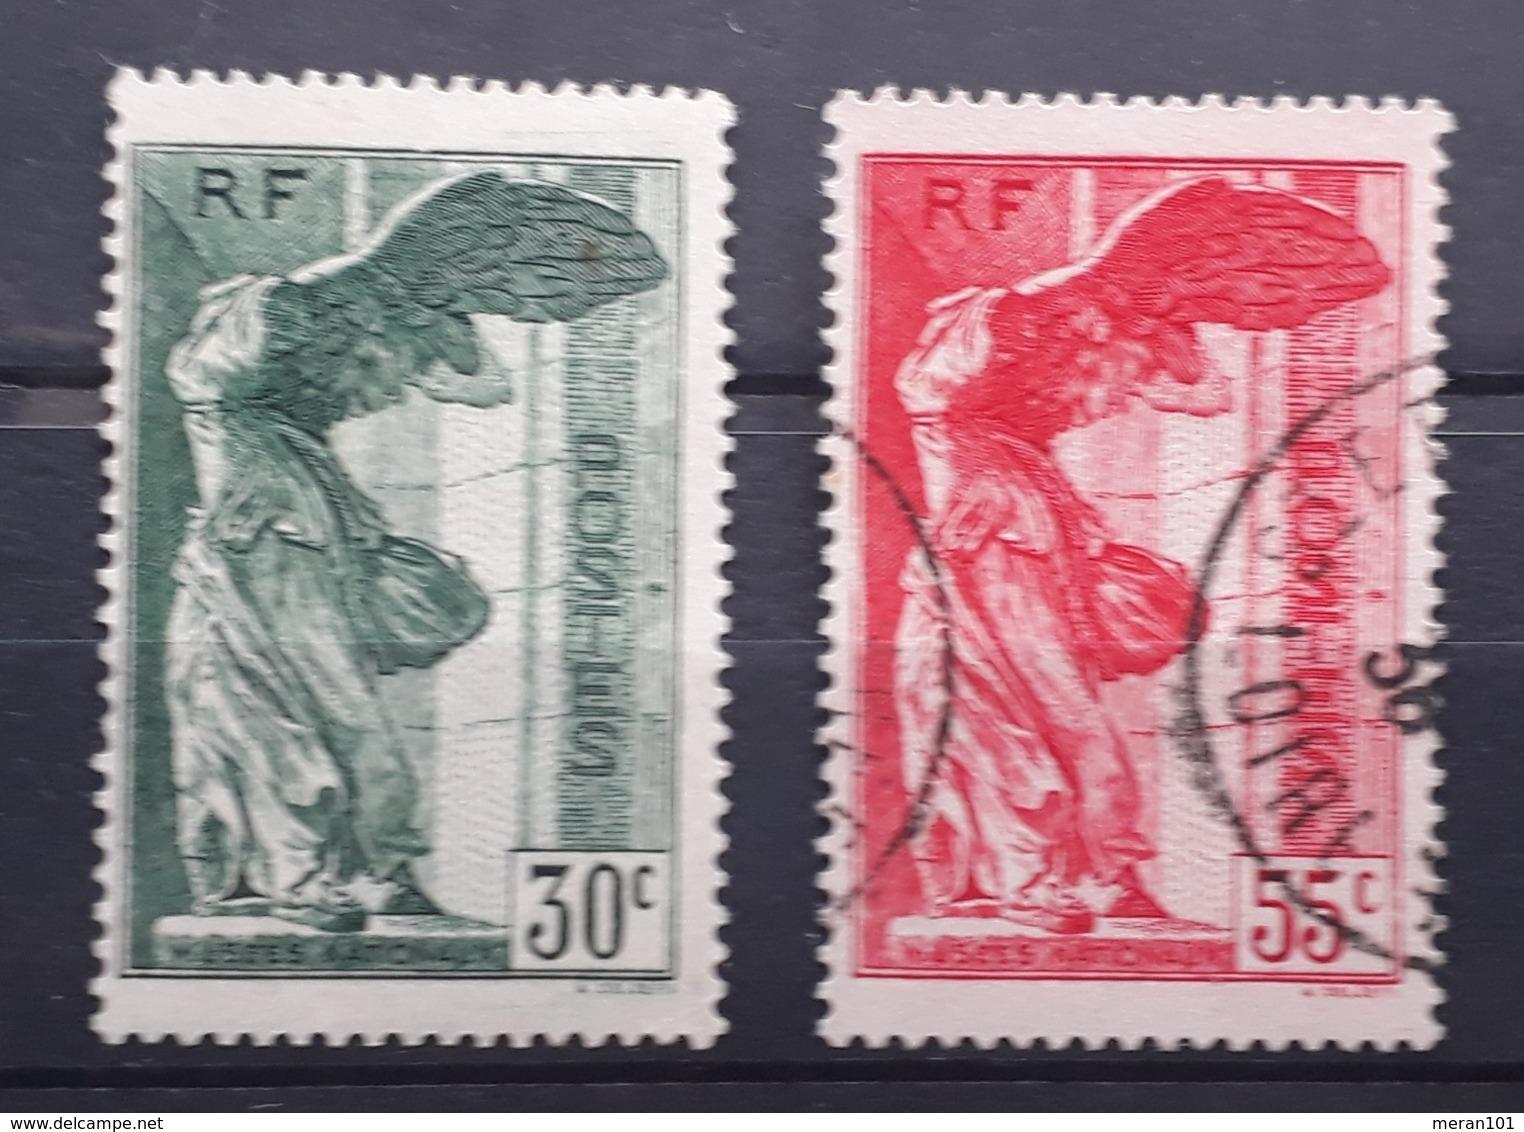 Frankreich 1937 - Mi 359-360 Gestempelt - Used Stamps